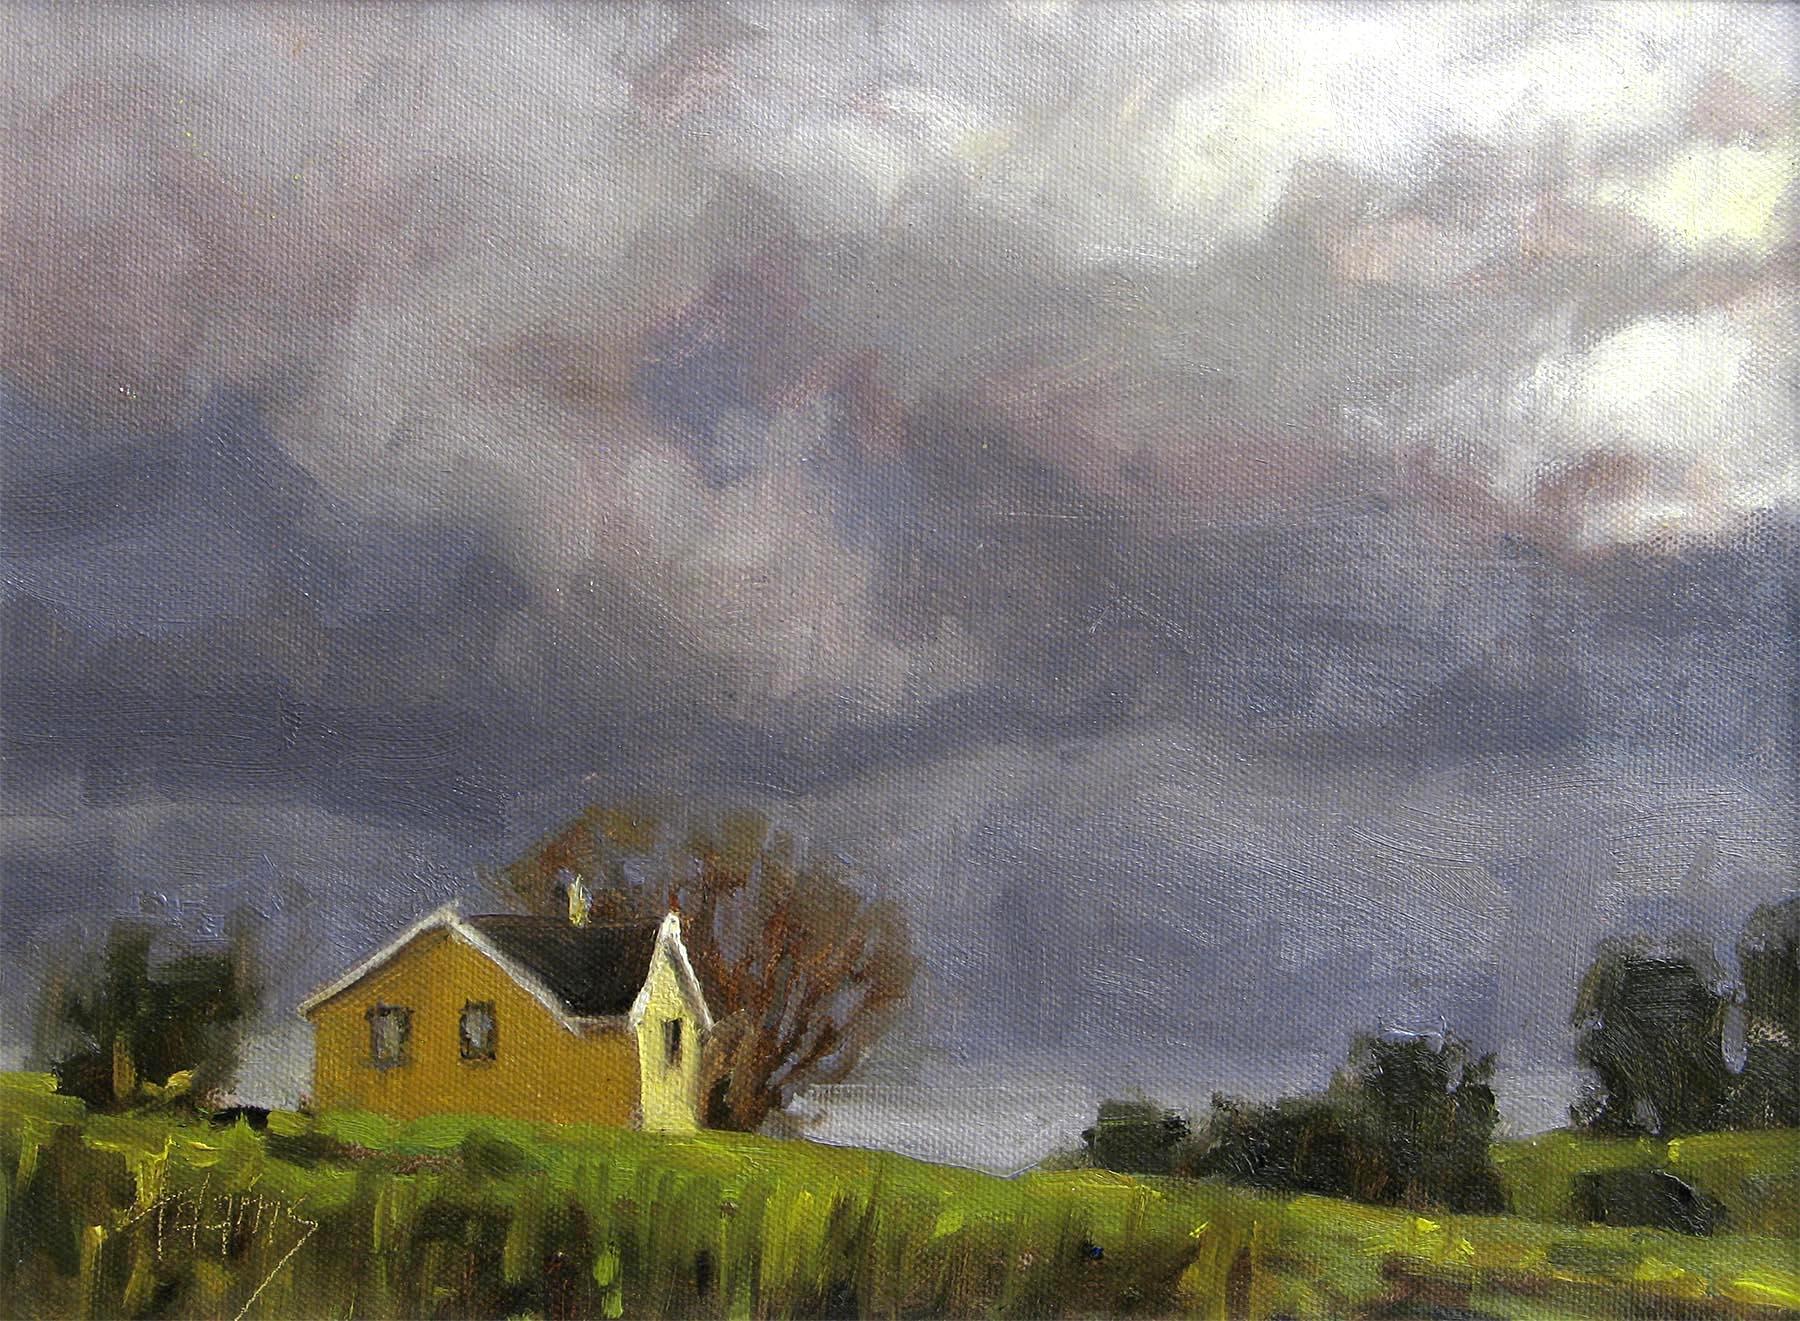 Yellow House and Stormy Skies - Gaye Adams